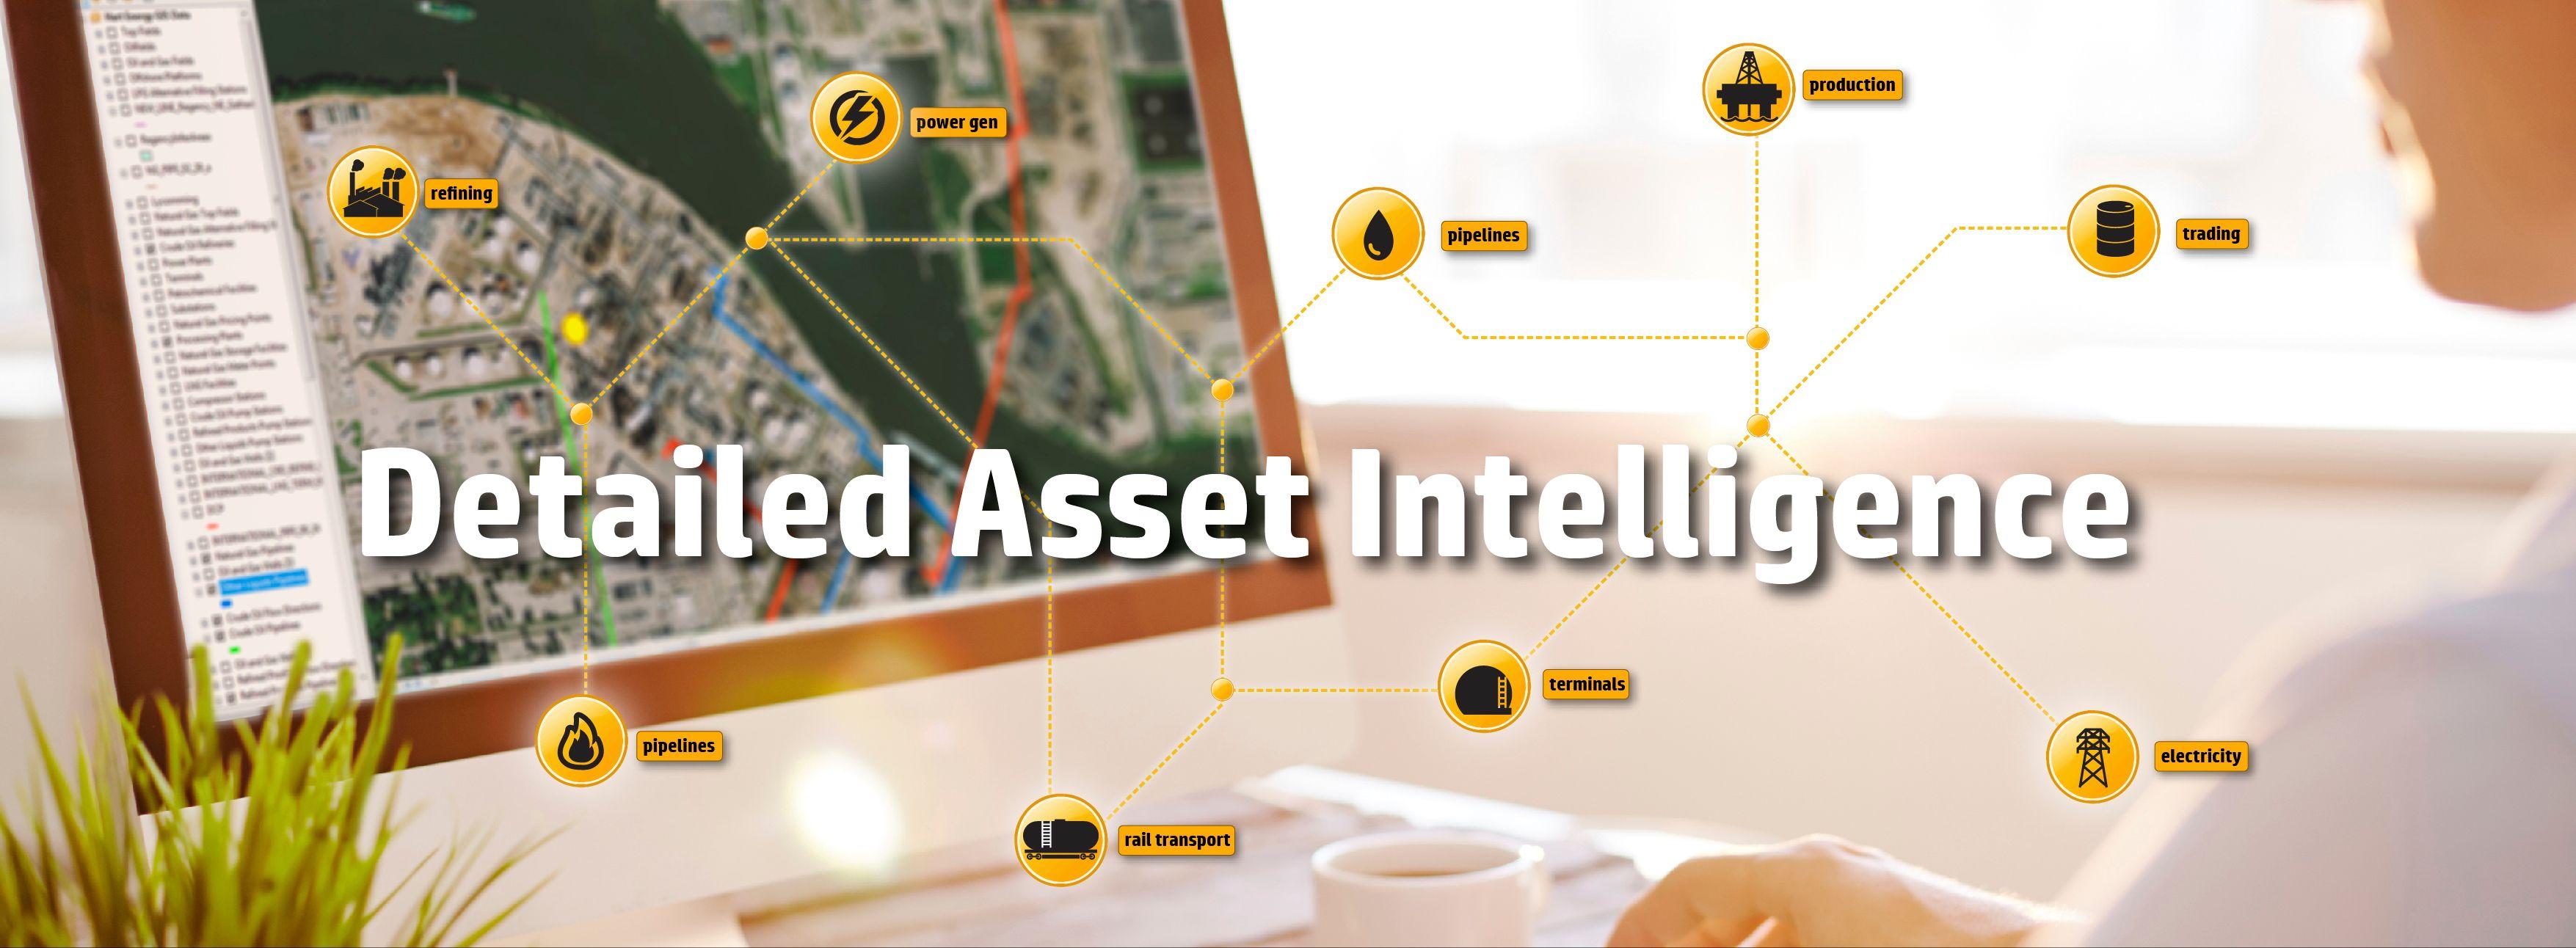 https://files.rextag.com/public/Detailed-Asset-Intelligence